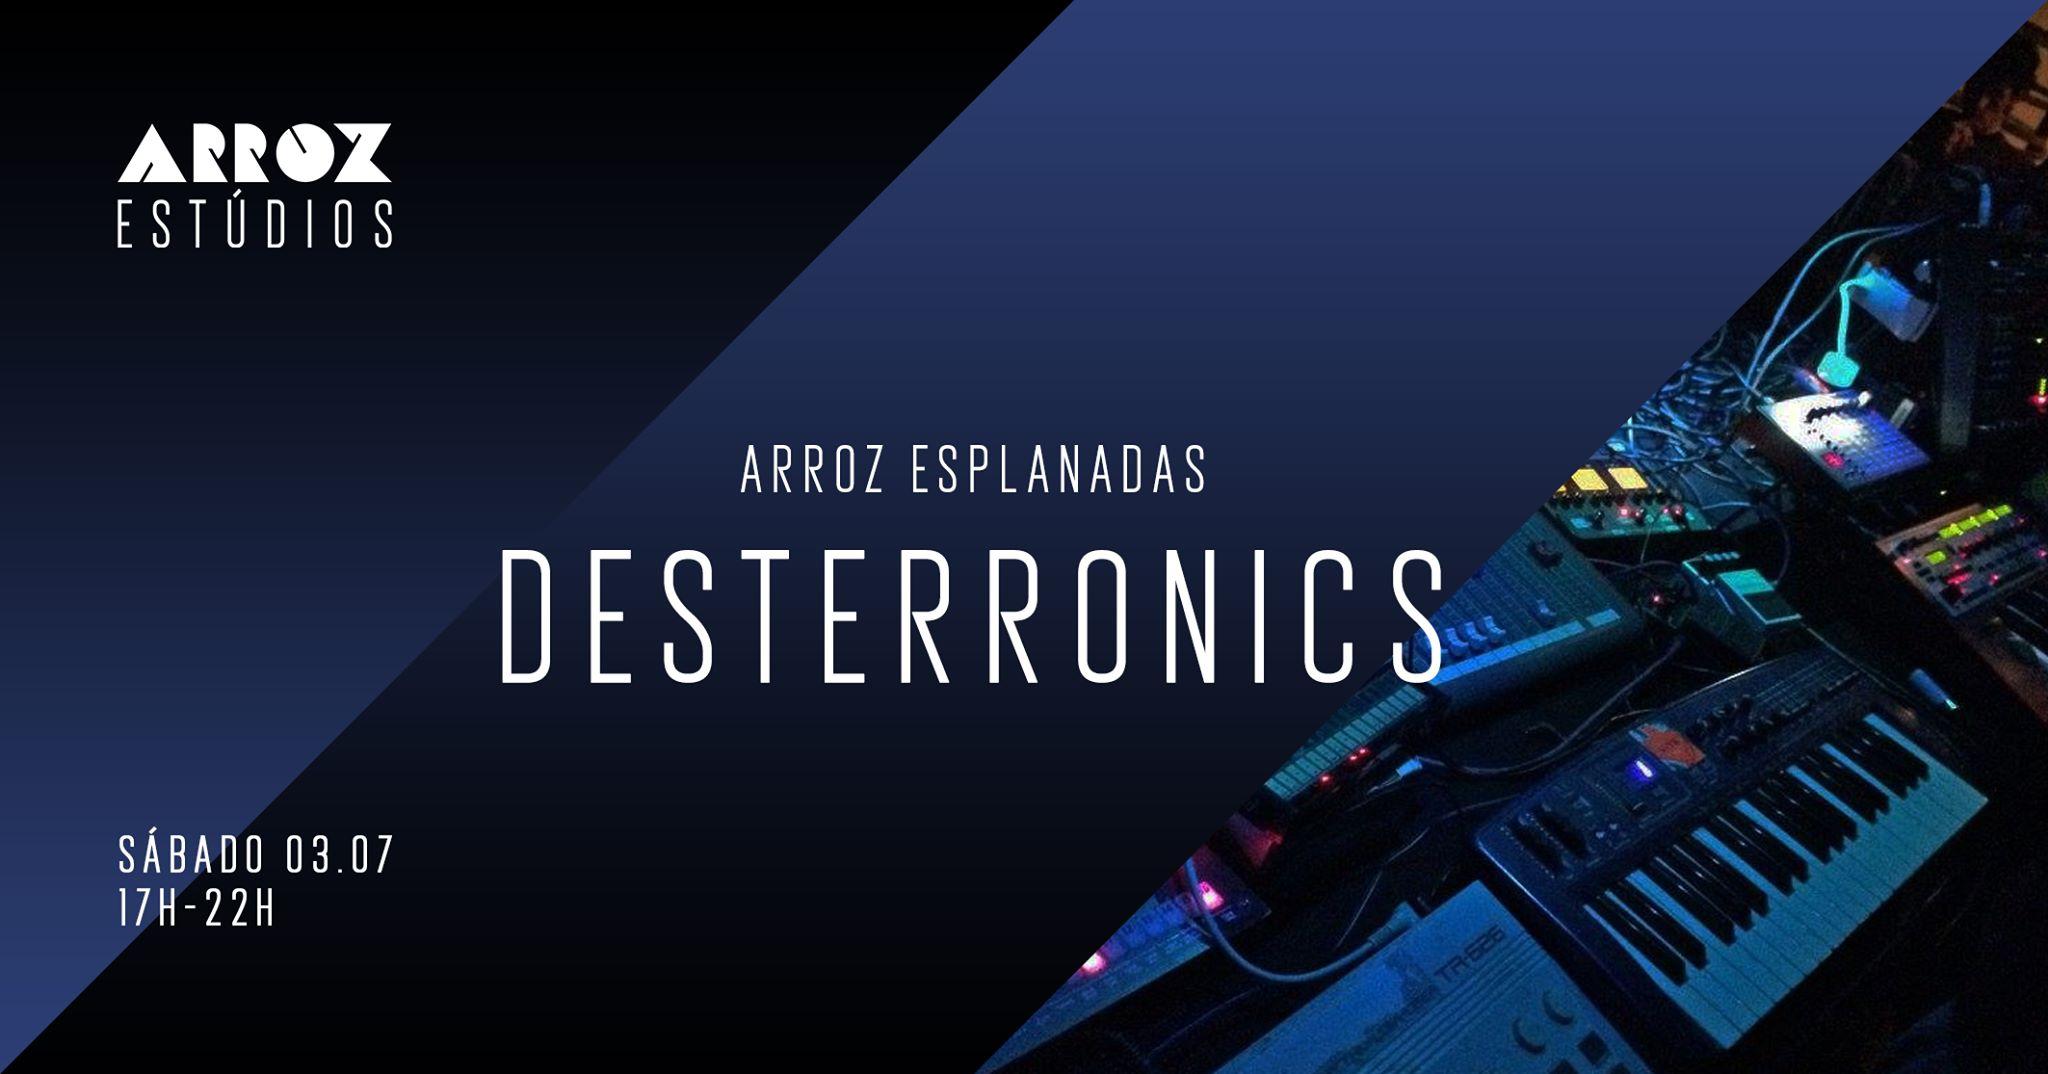 Desterronics - Arroz Esplanadas